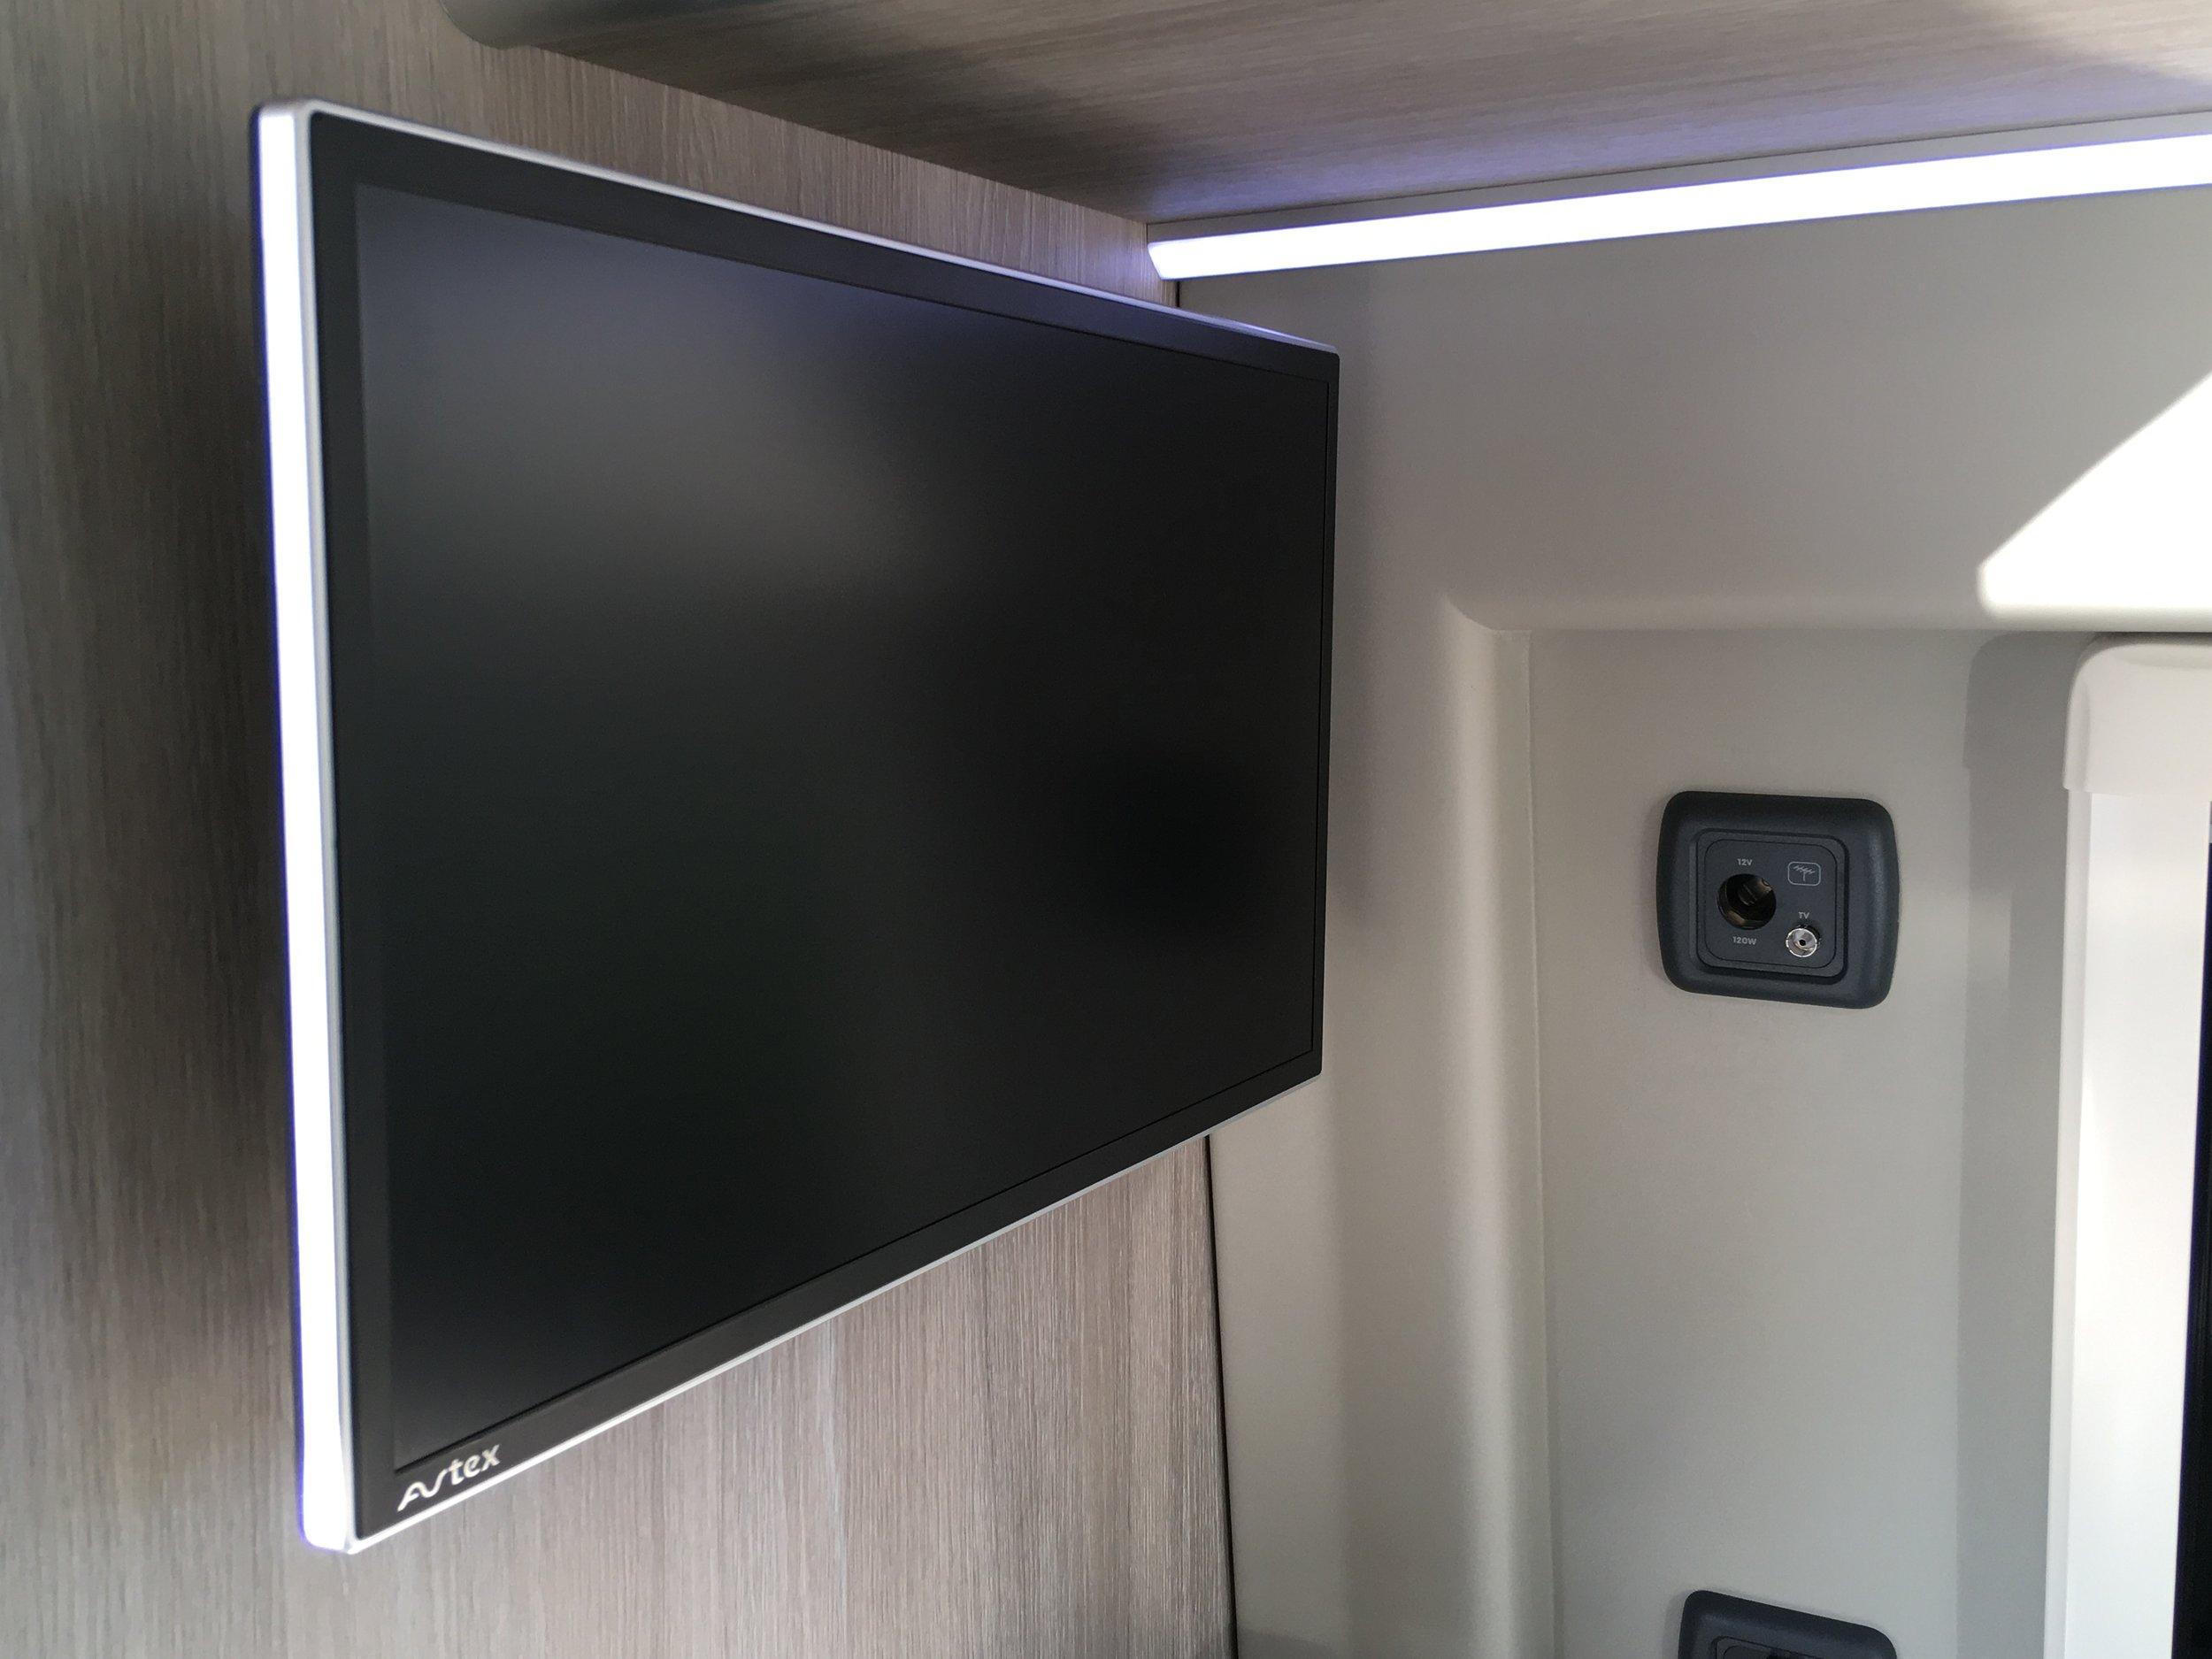 TV on lockable wall bracket